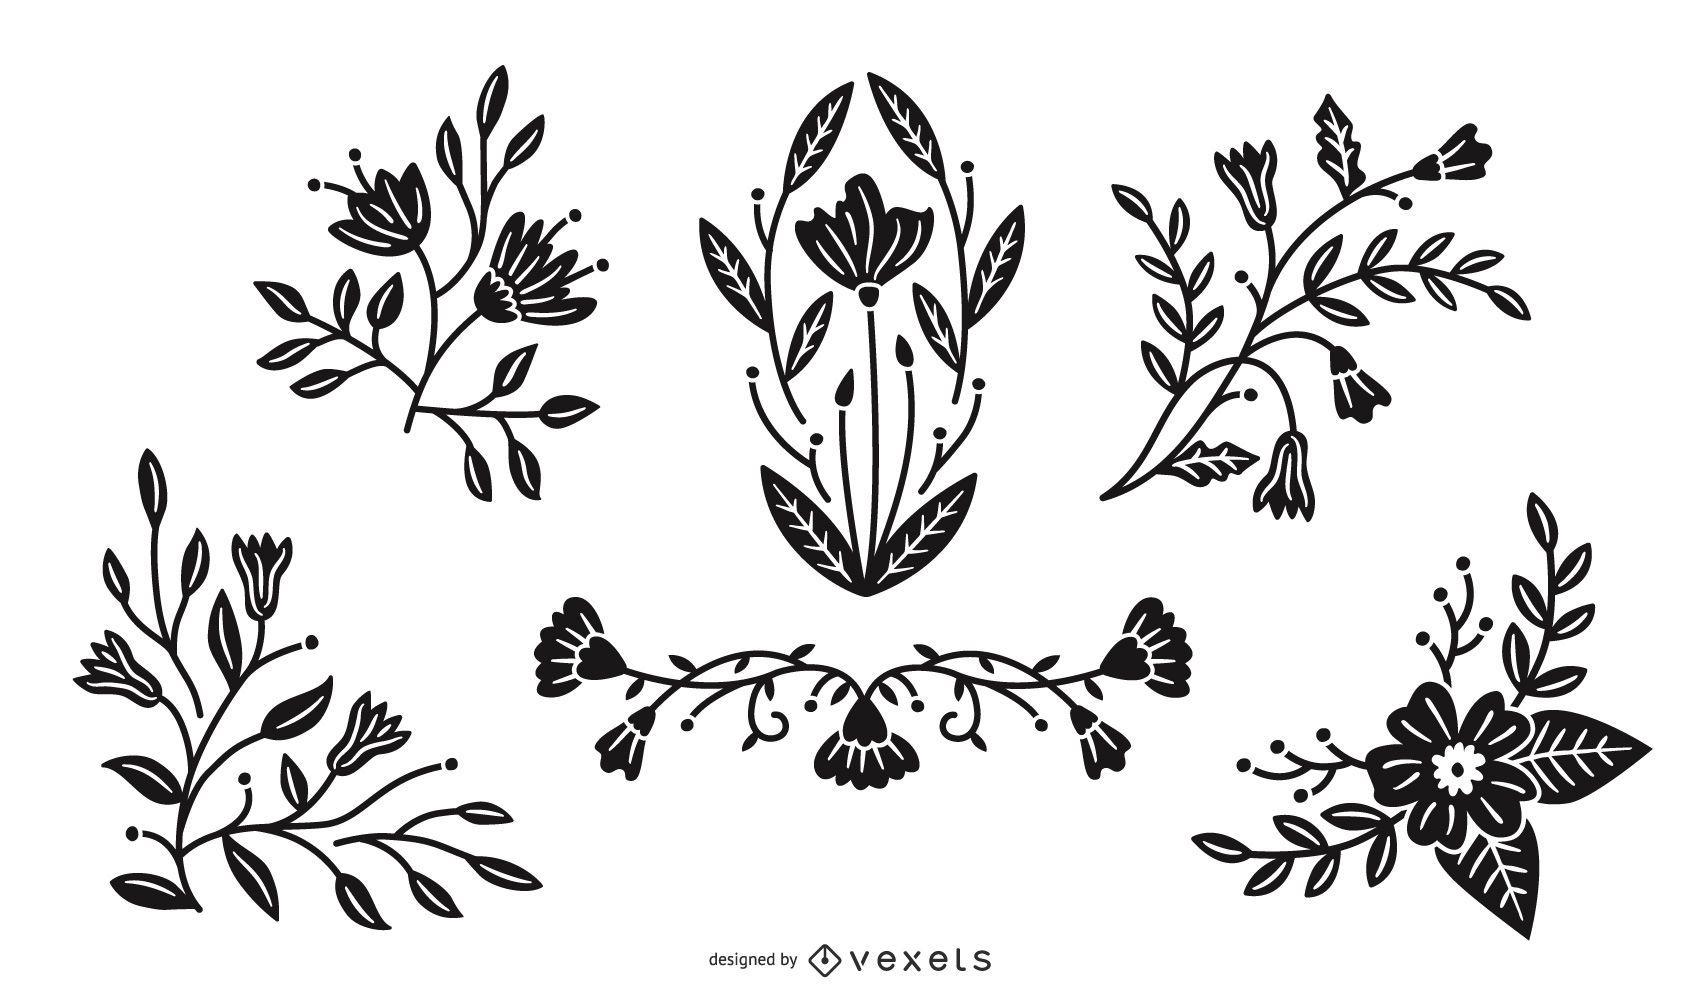 Spring Flowers Silhouette Illustration Pack